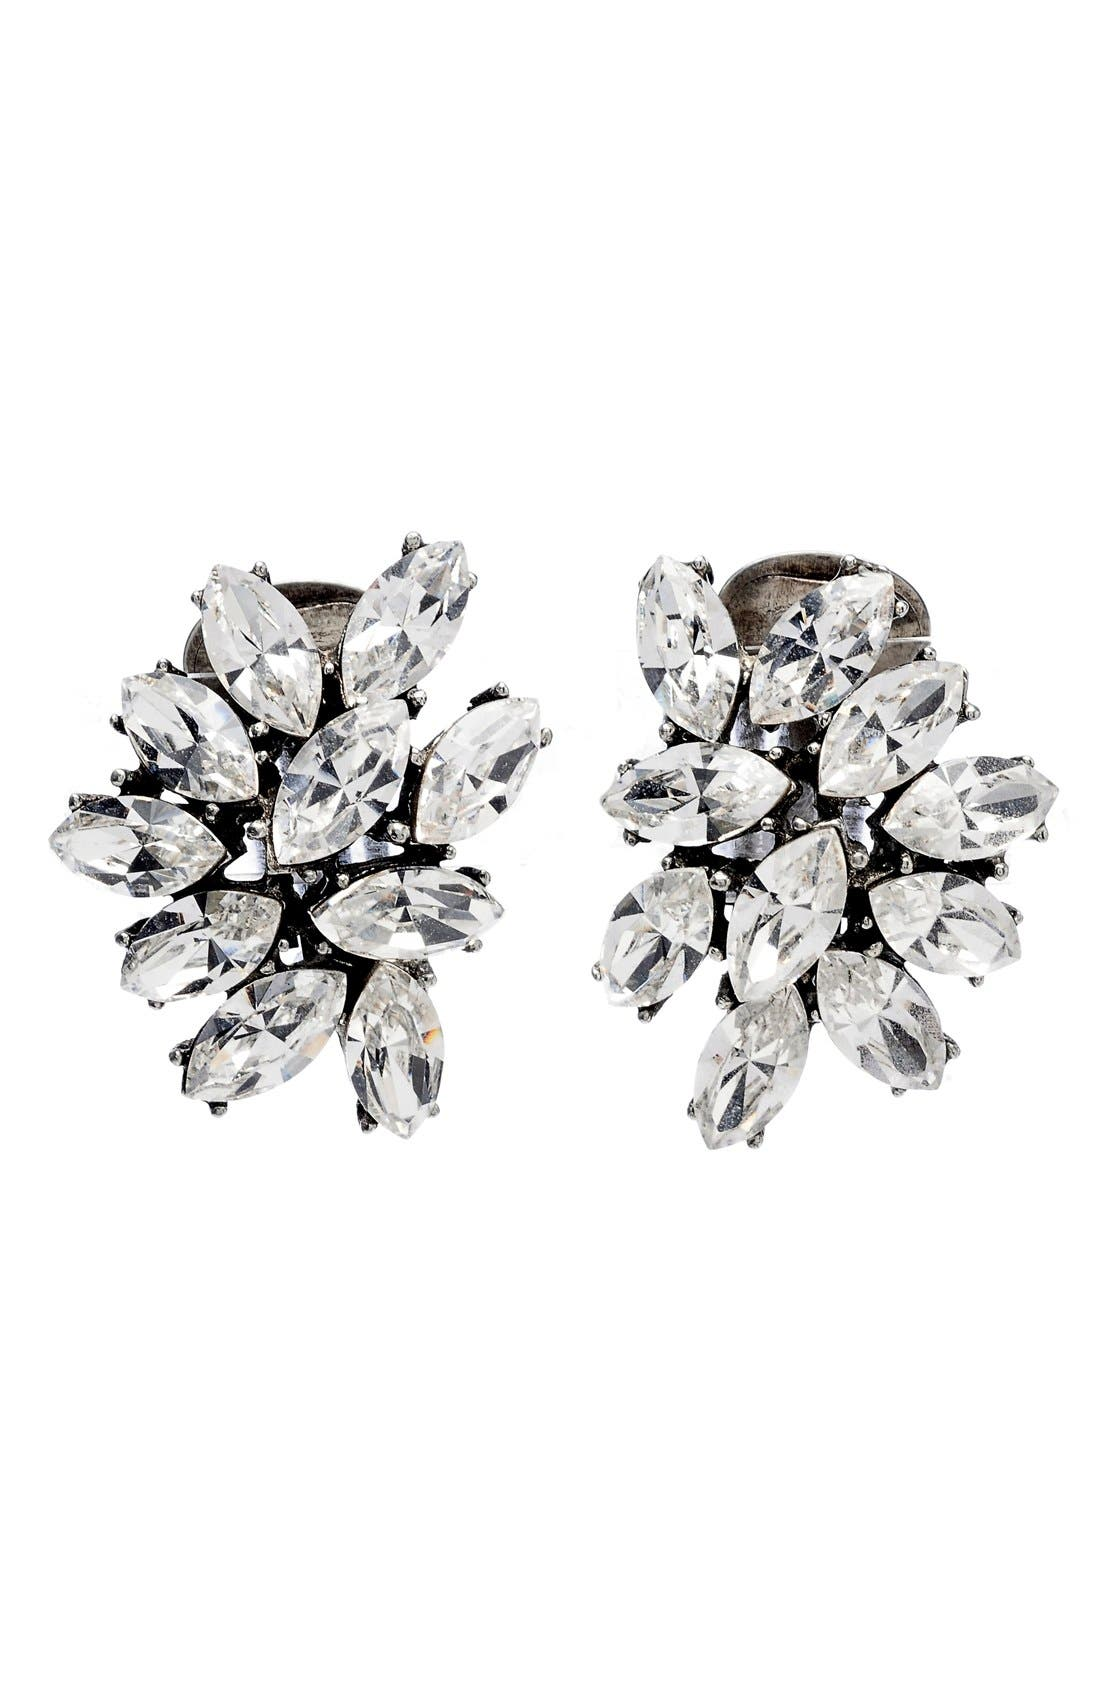 Swarovski Crystal Cluster Clip Earrings,                         Main,                         color, Silver